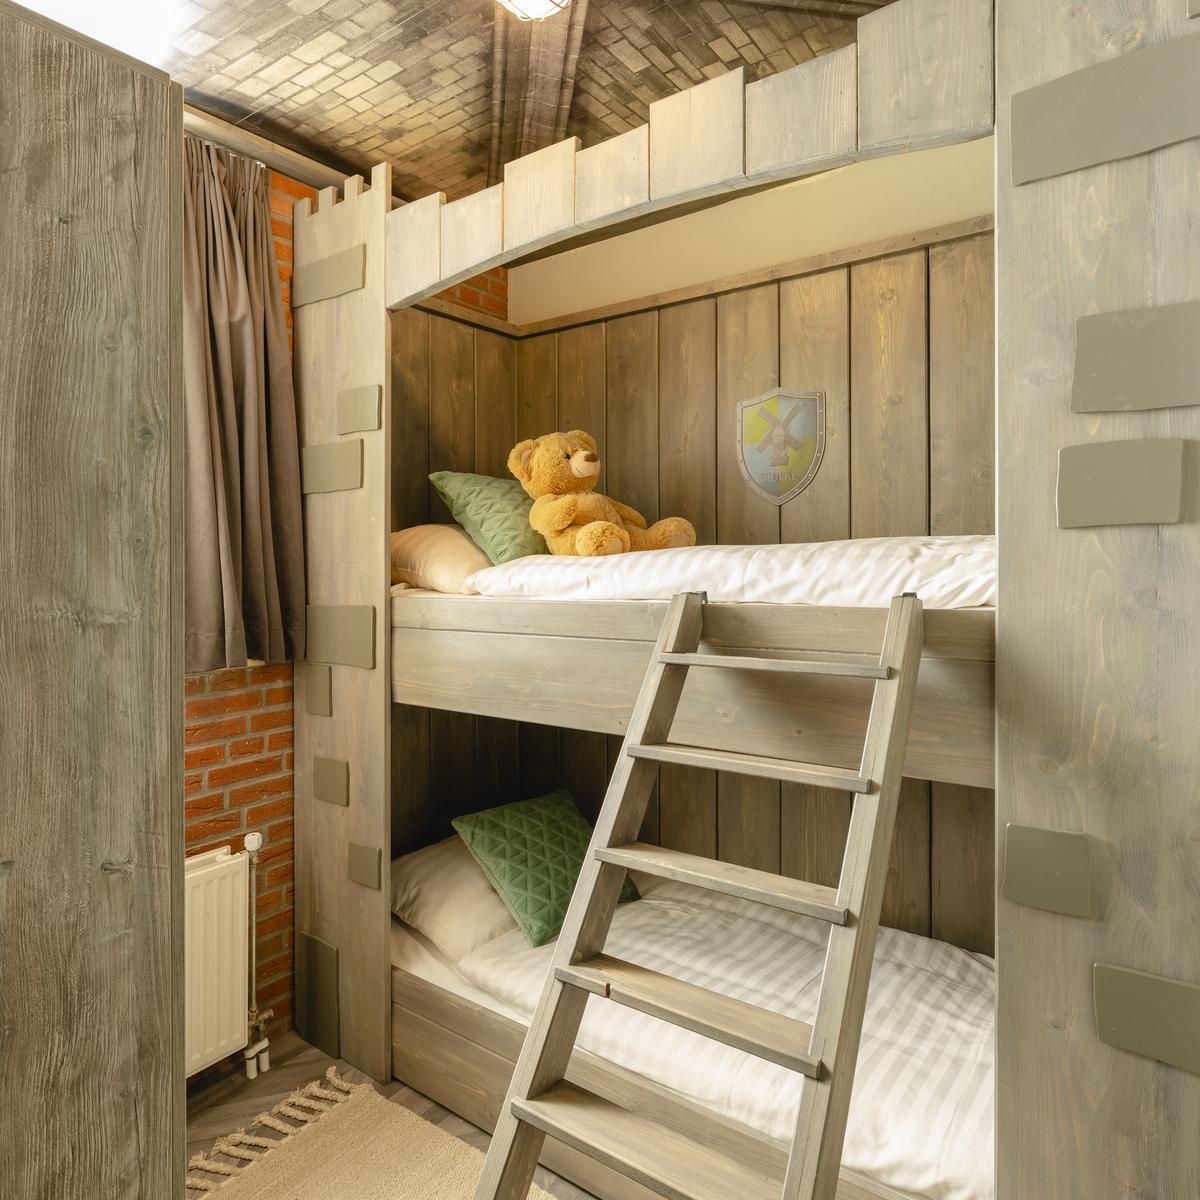 5-person baby & children's bungalow